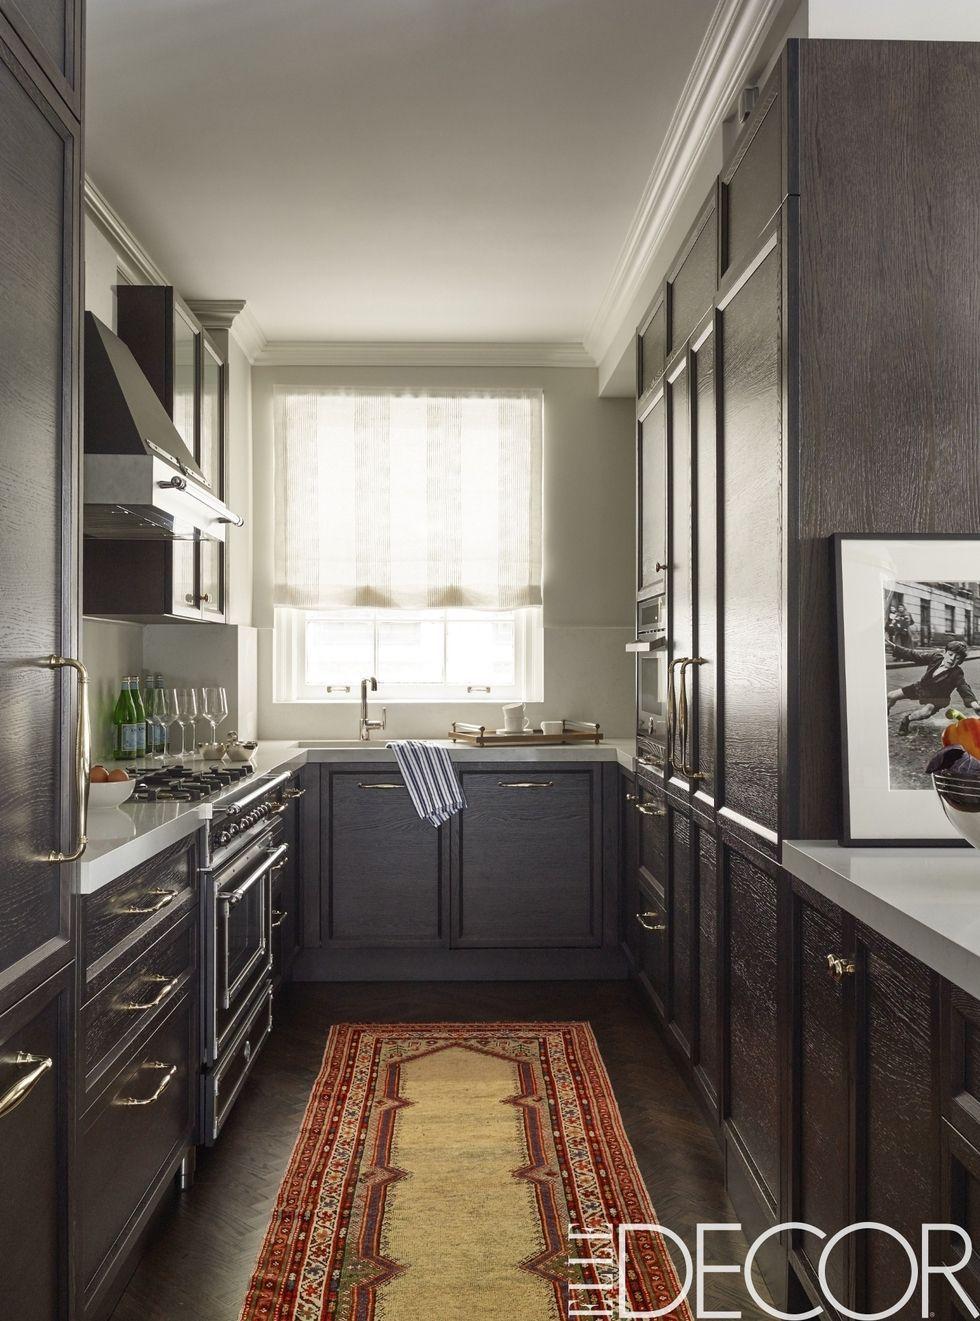 Small Kitchen Design 50+ small kitchen design ideas - decorating tiny kitchens YPZDXWI